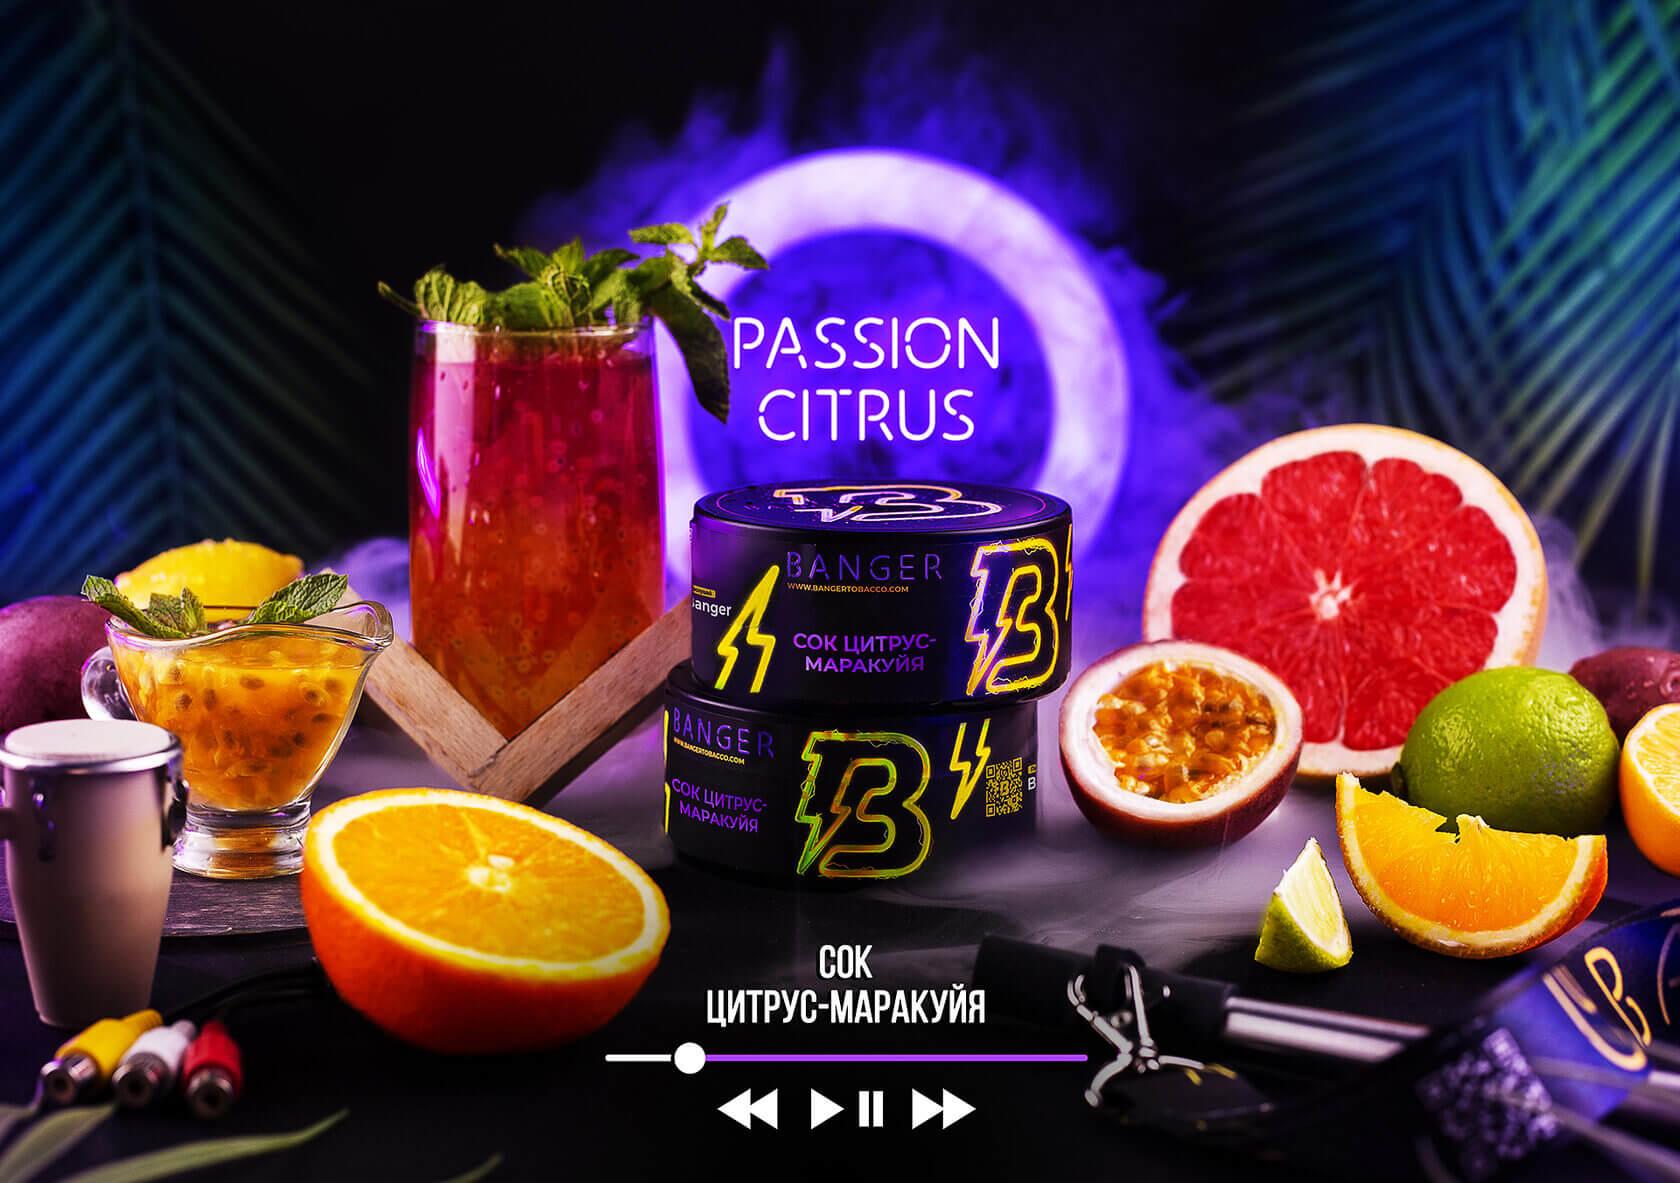 Табак Banger Passion citrus (Сок цитрус-маракуйя)